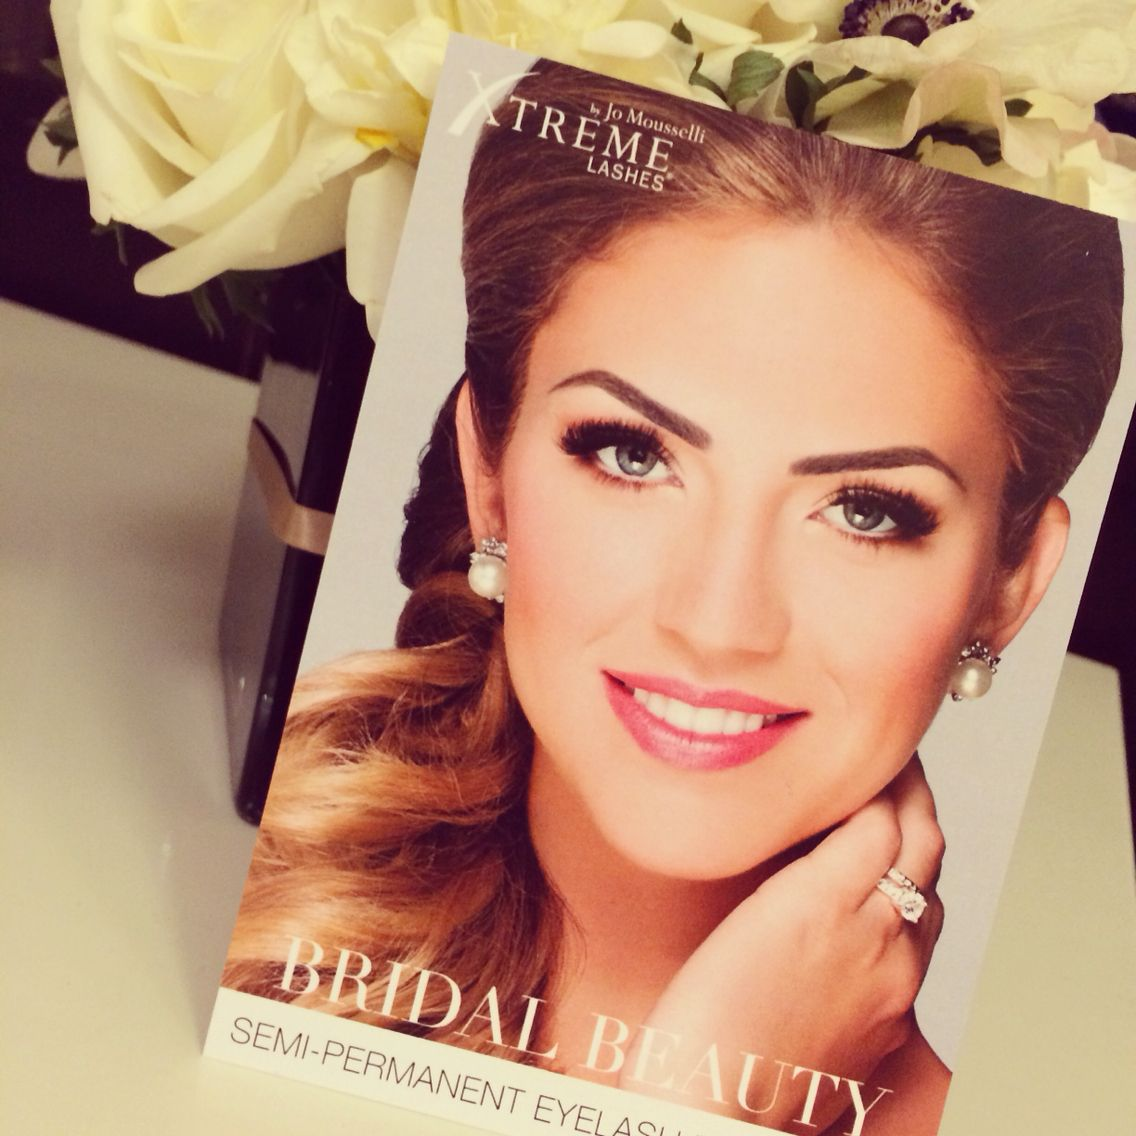 Bridal Beauty Xtreme lashes, Bridal beauty, Beauty